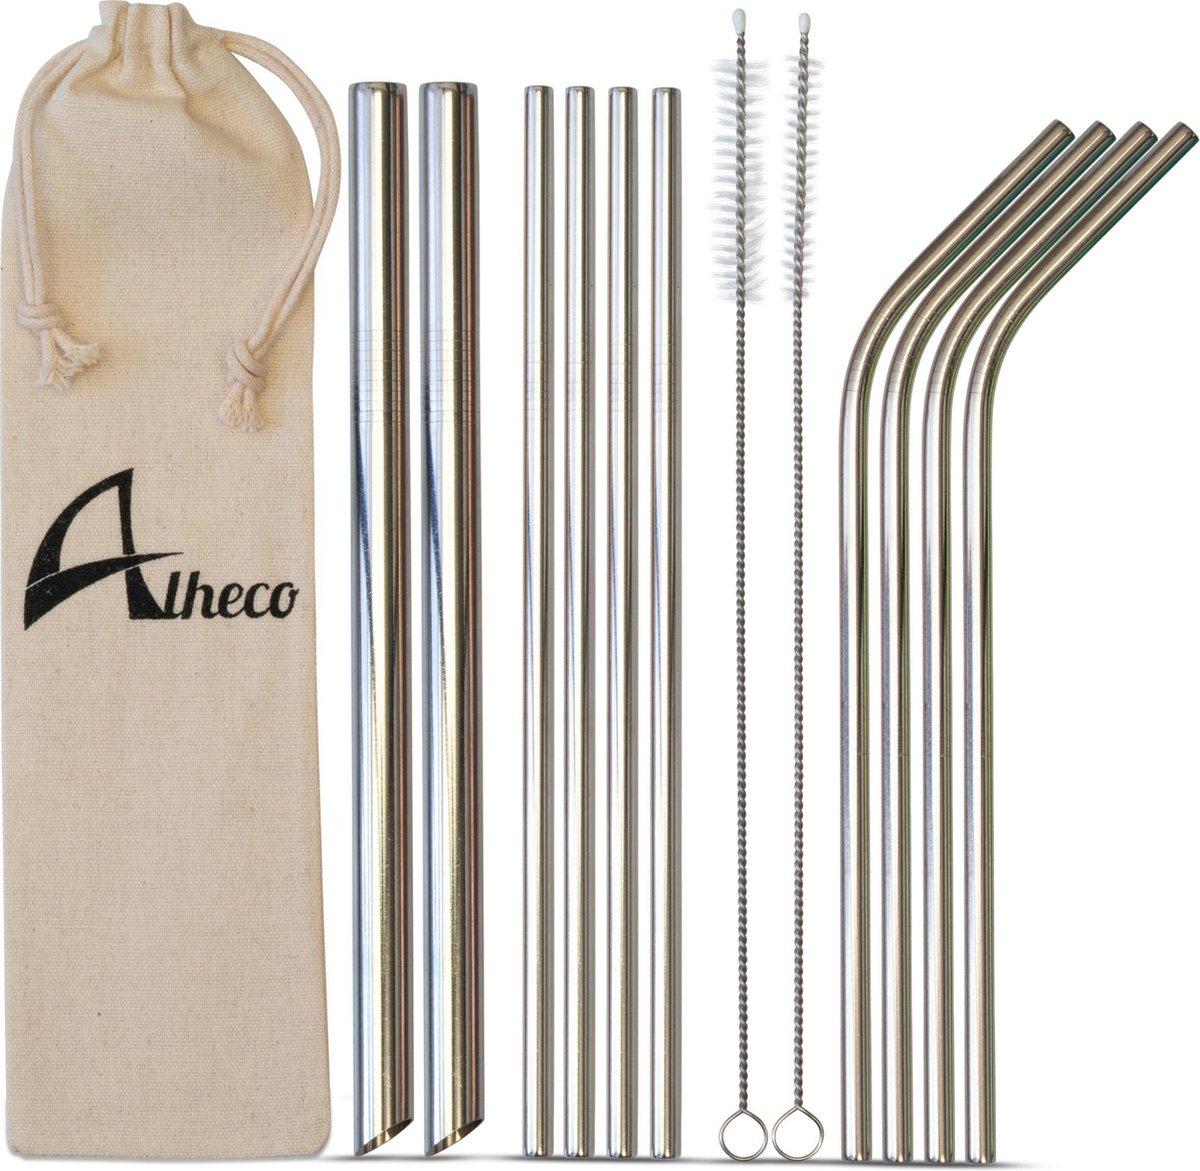 Herbruikbare metalen rietjes – 13-delige set – RVS smoothie & cocktail rietjes - Zilver